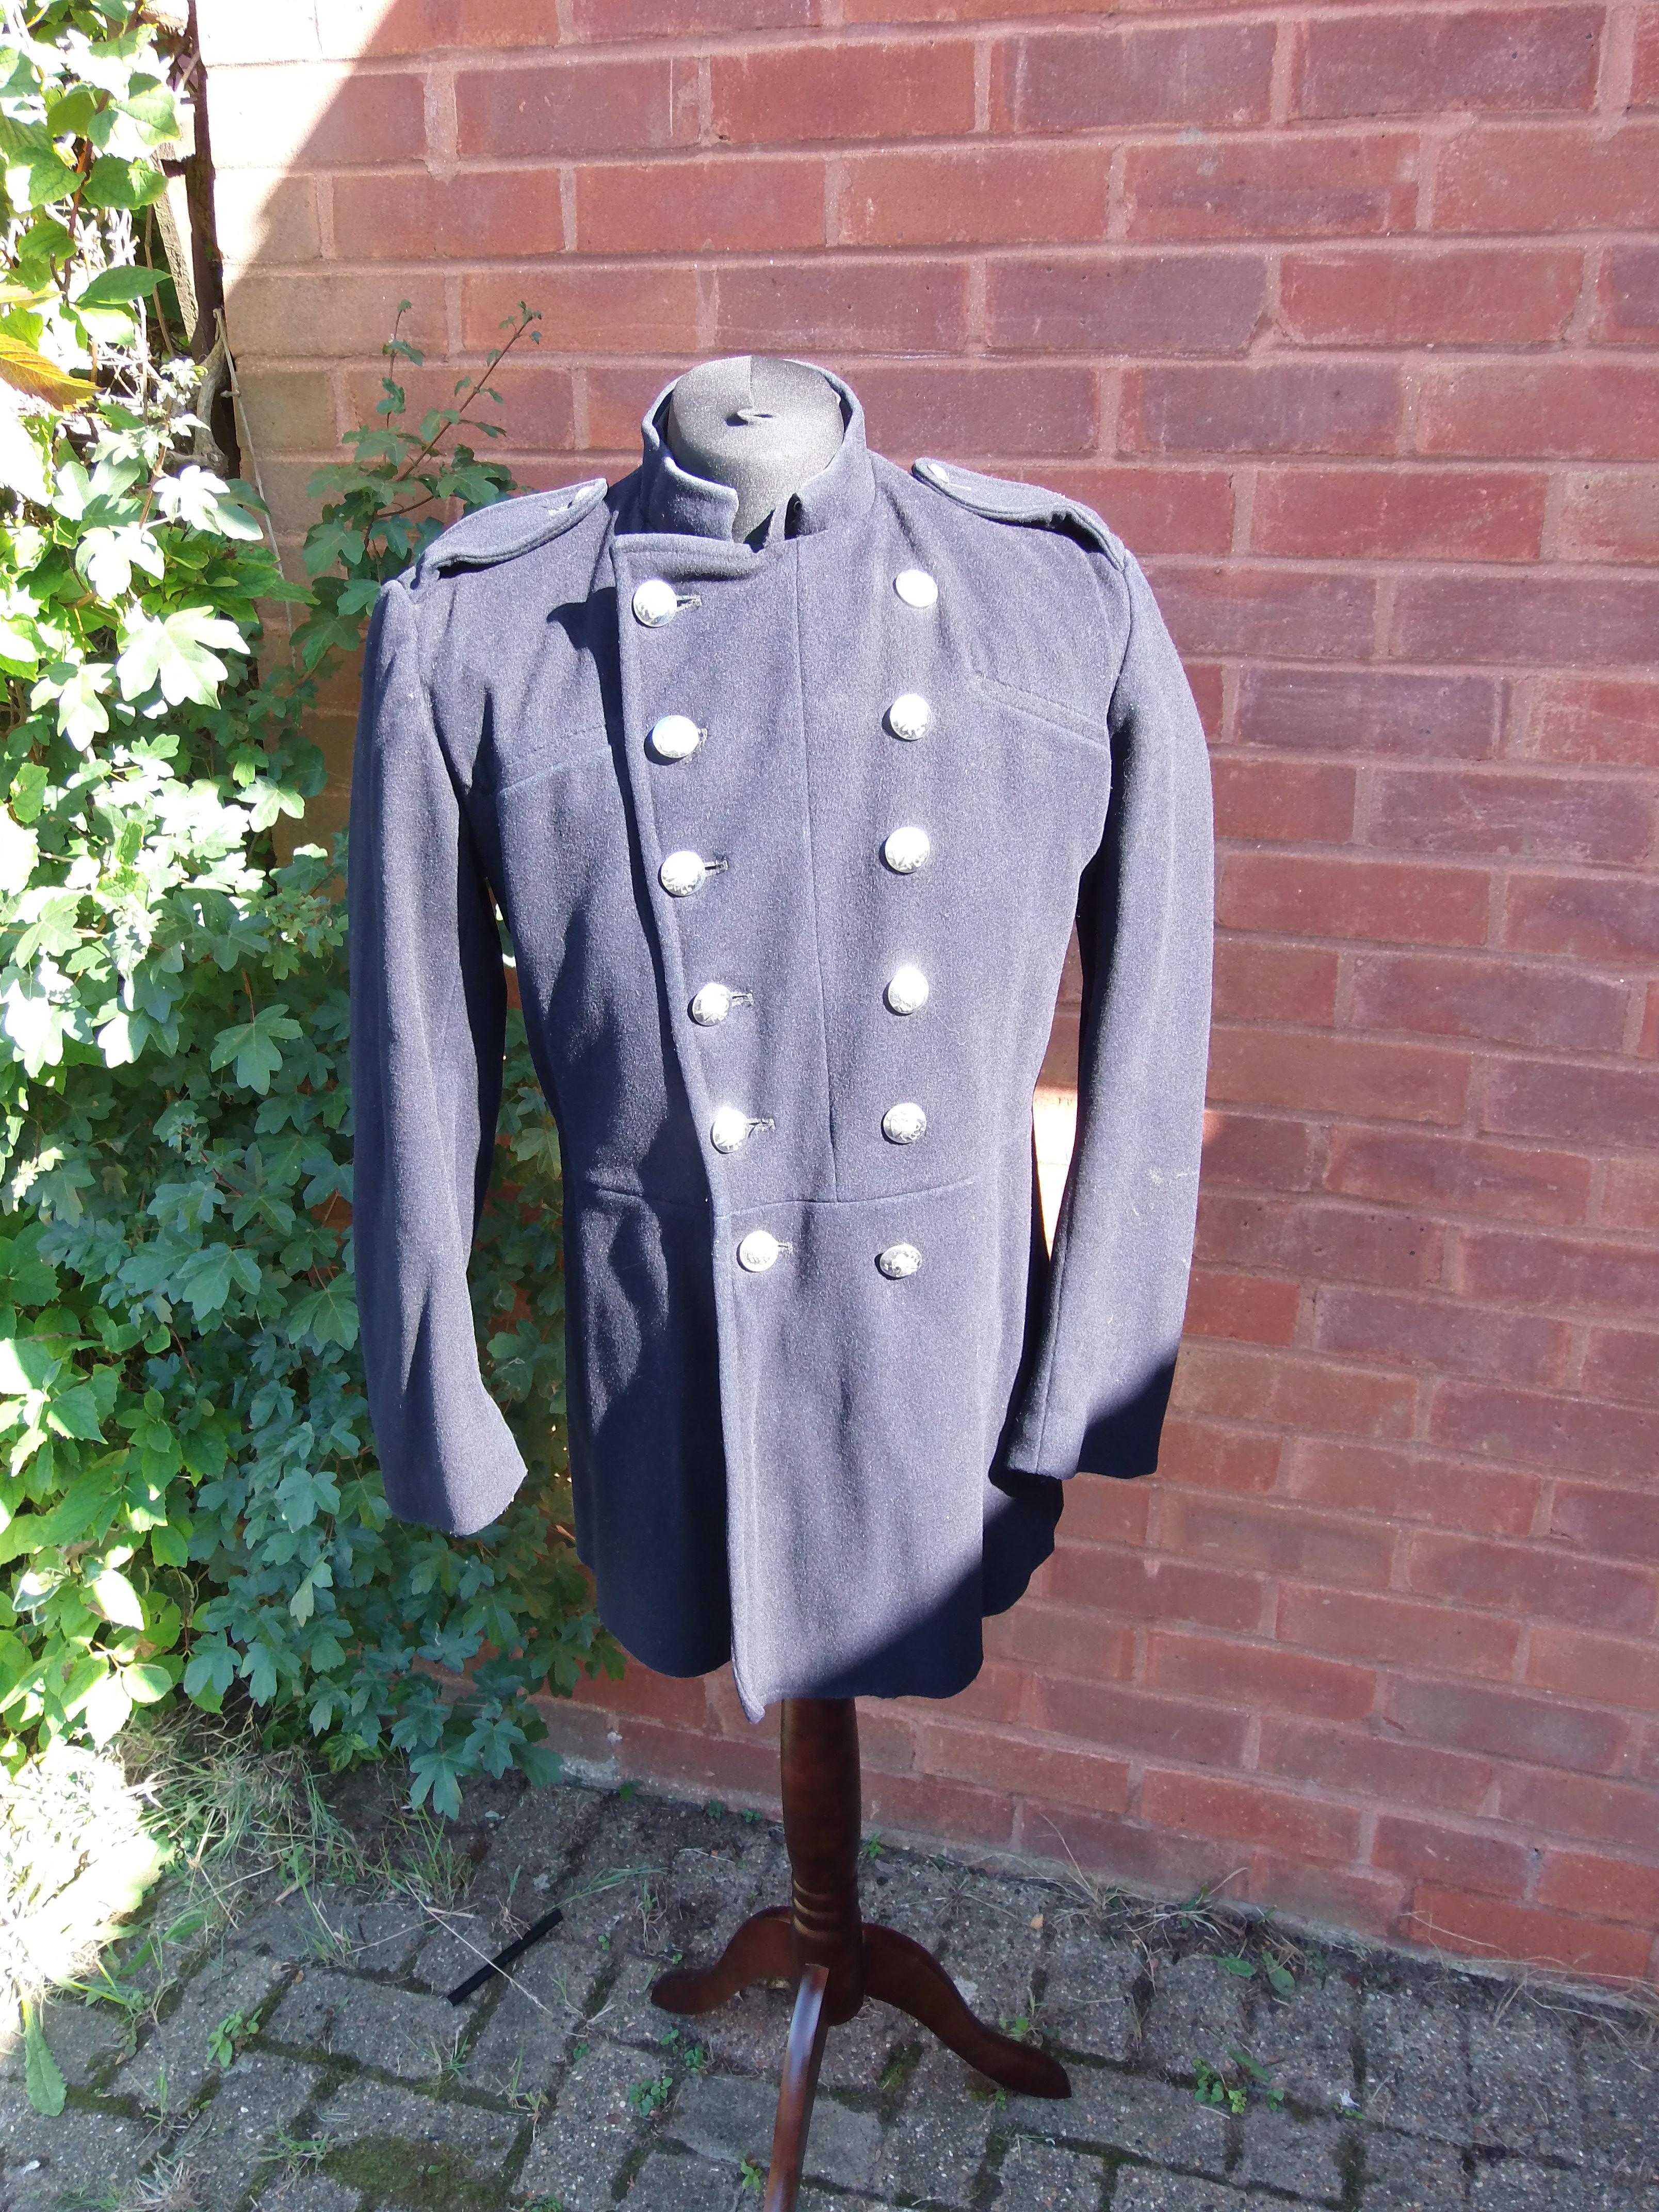 MKTOC Victorian Policeman